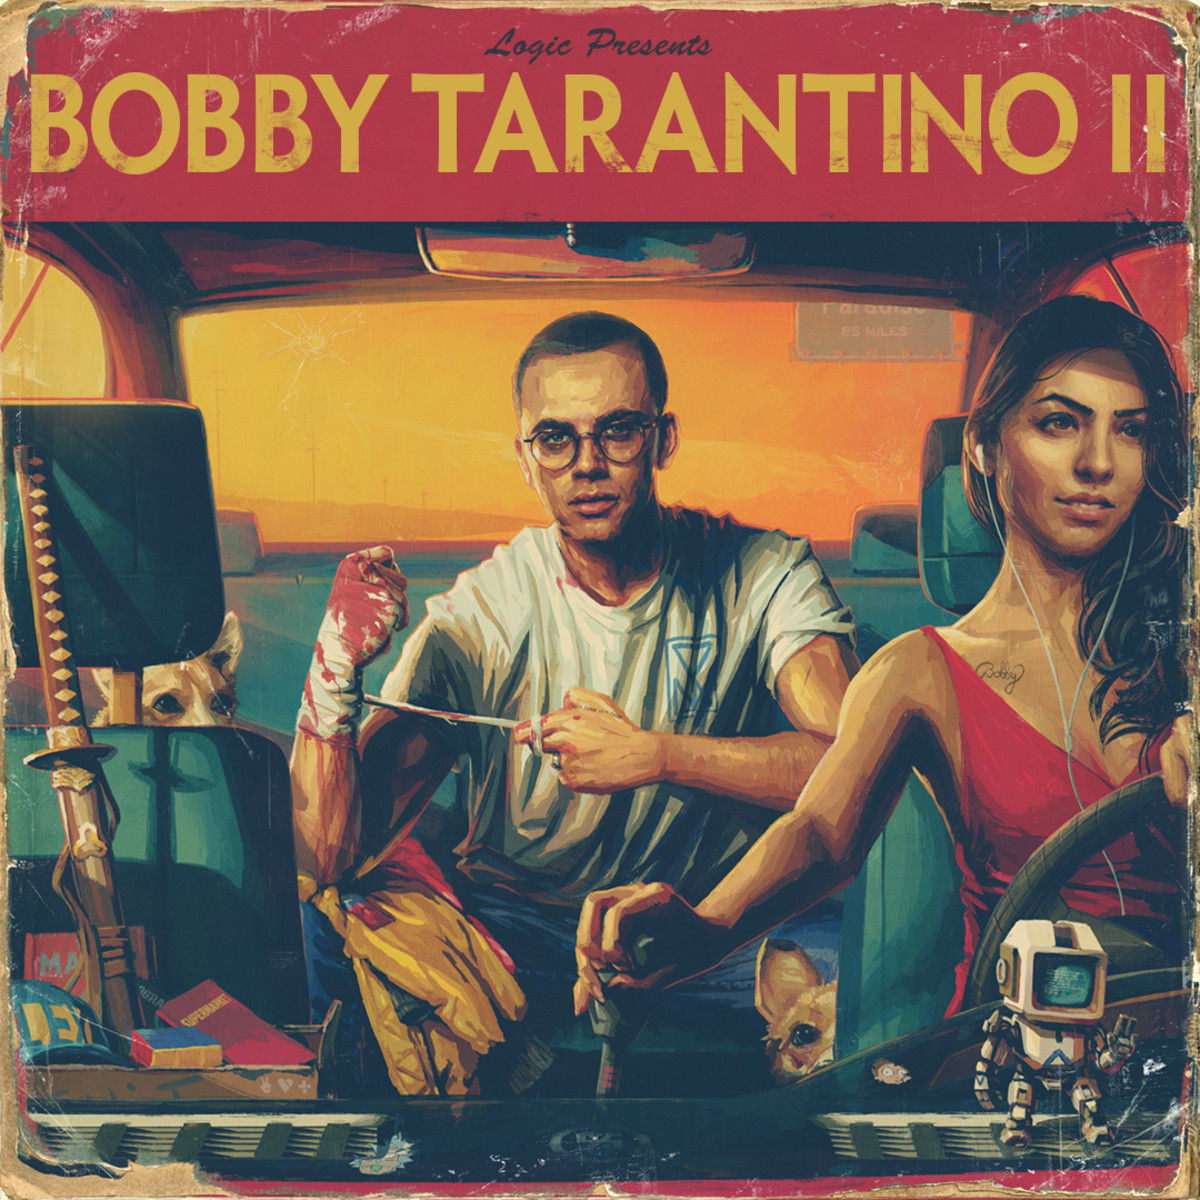 Logic Bobby Tarantino II cover